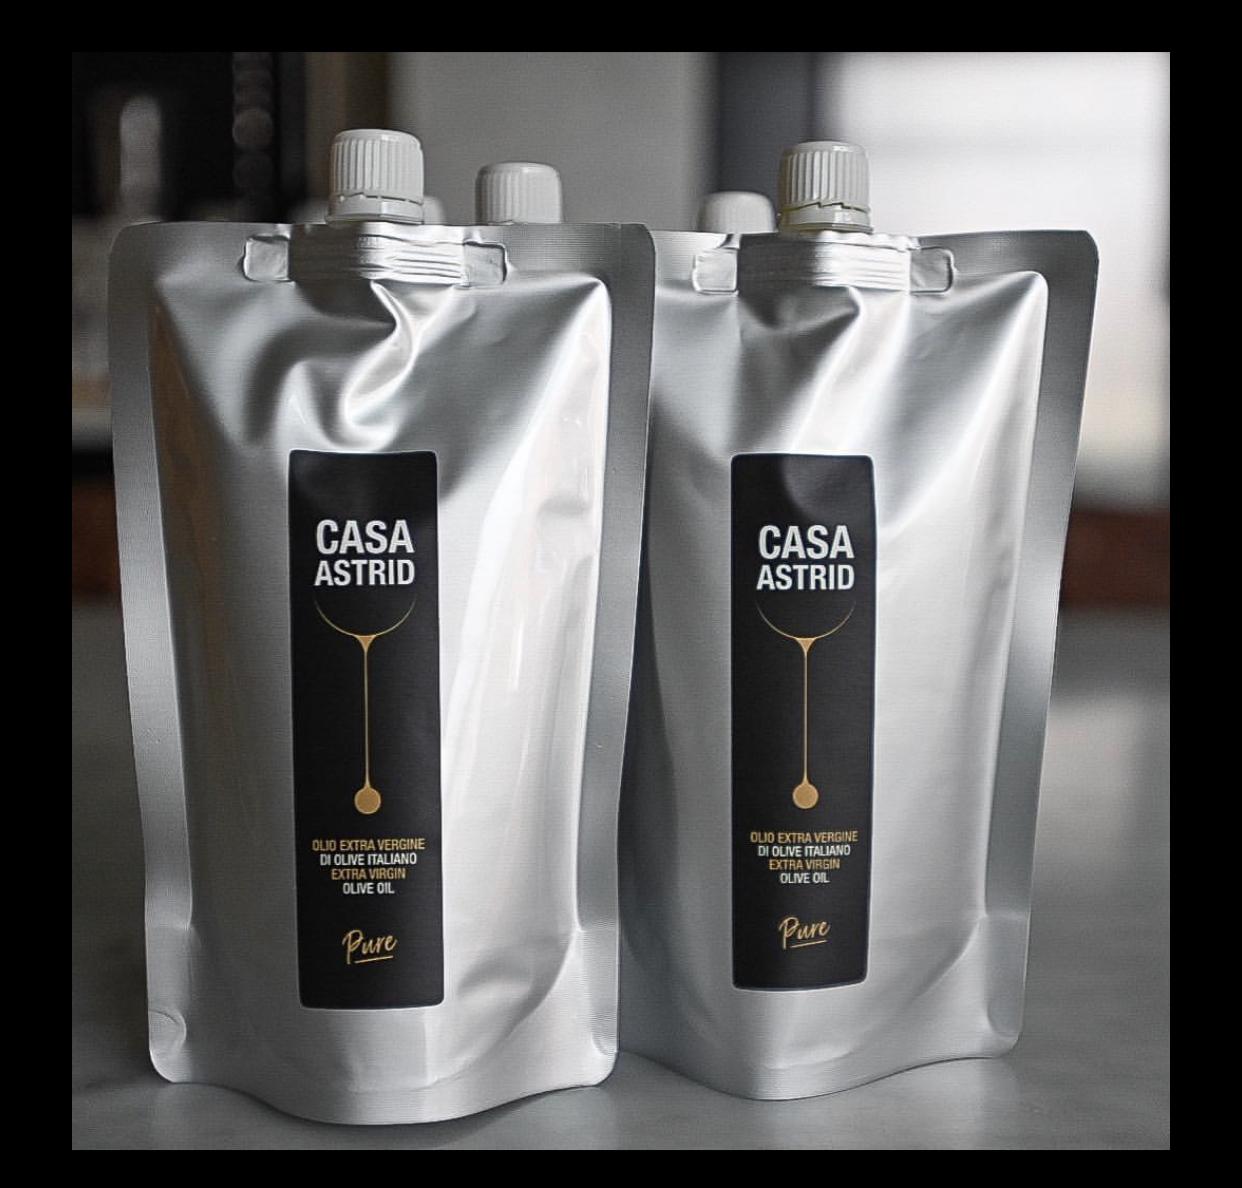 Casa Astrid lanceert ecologische navulling extra vierge olijfolie